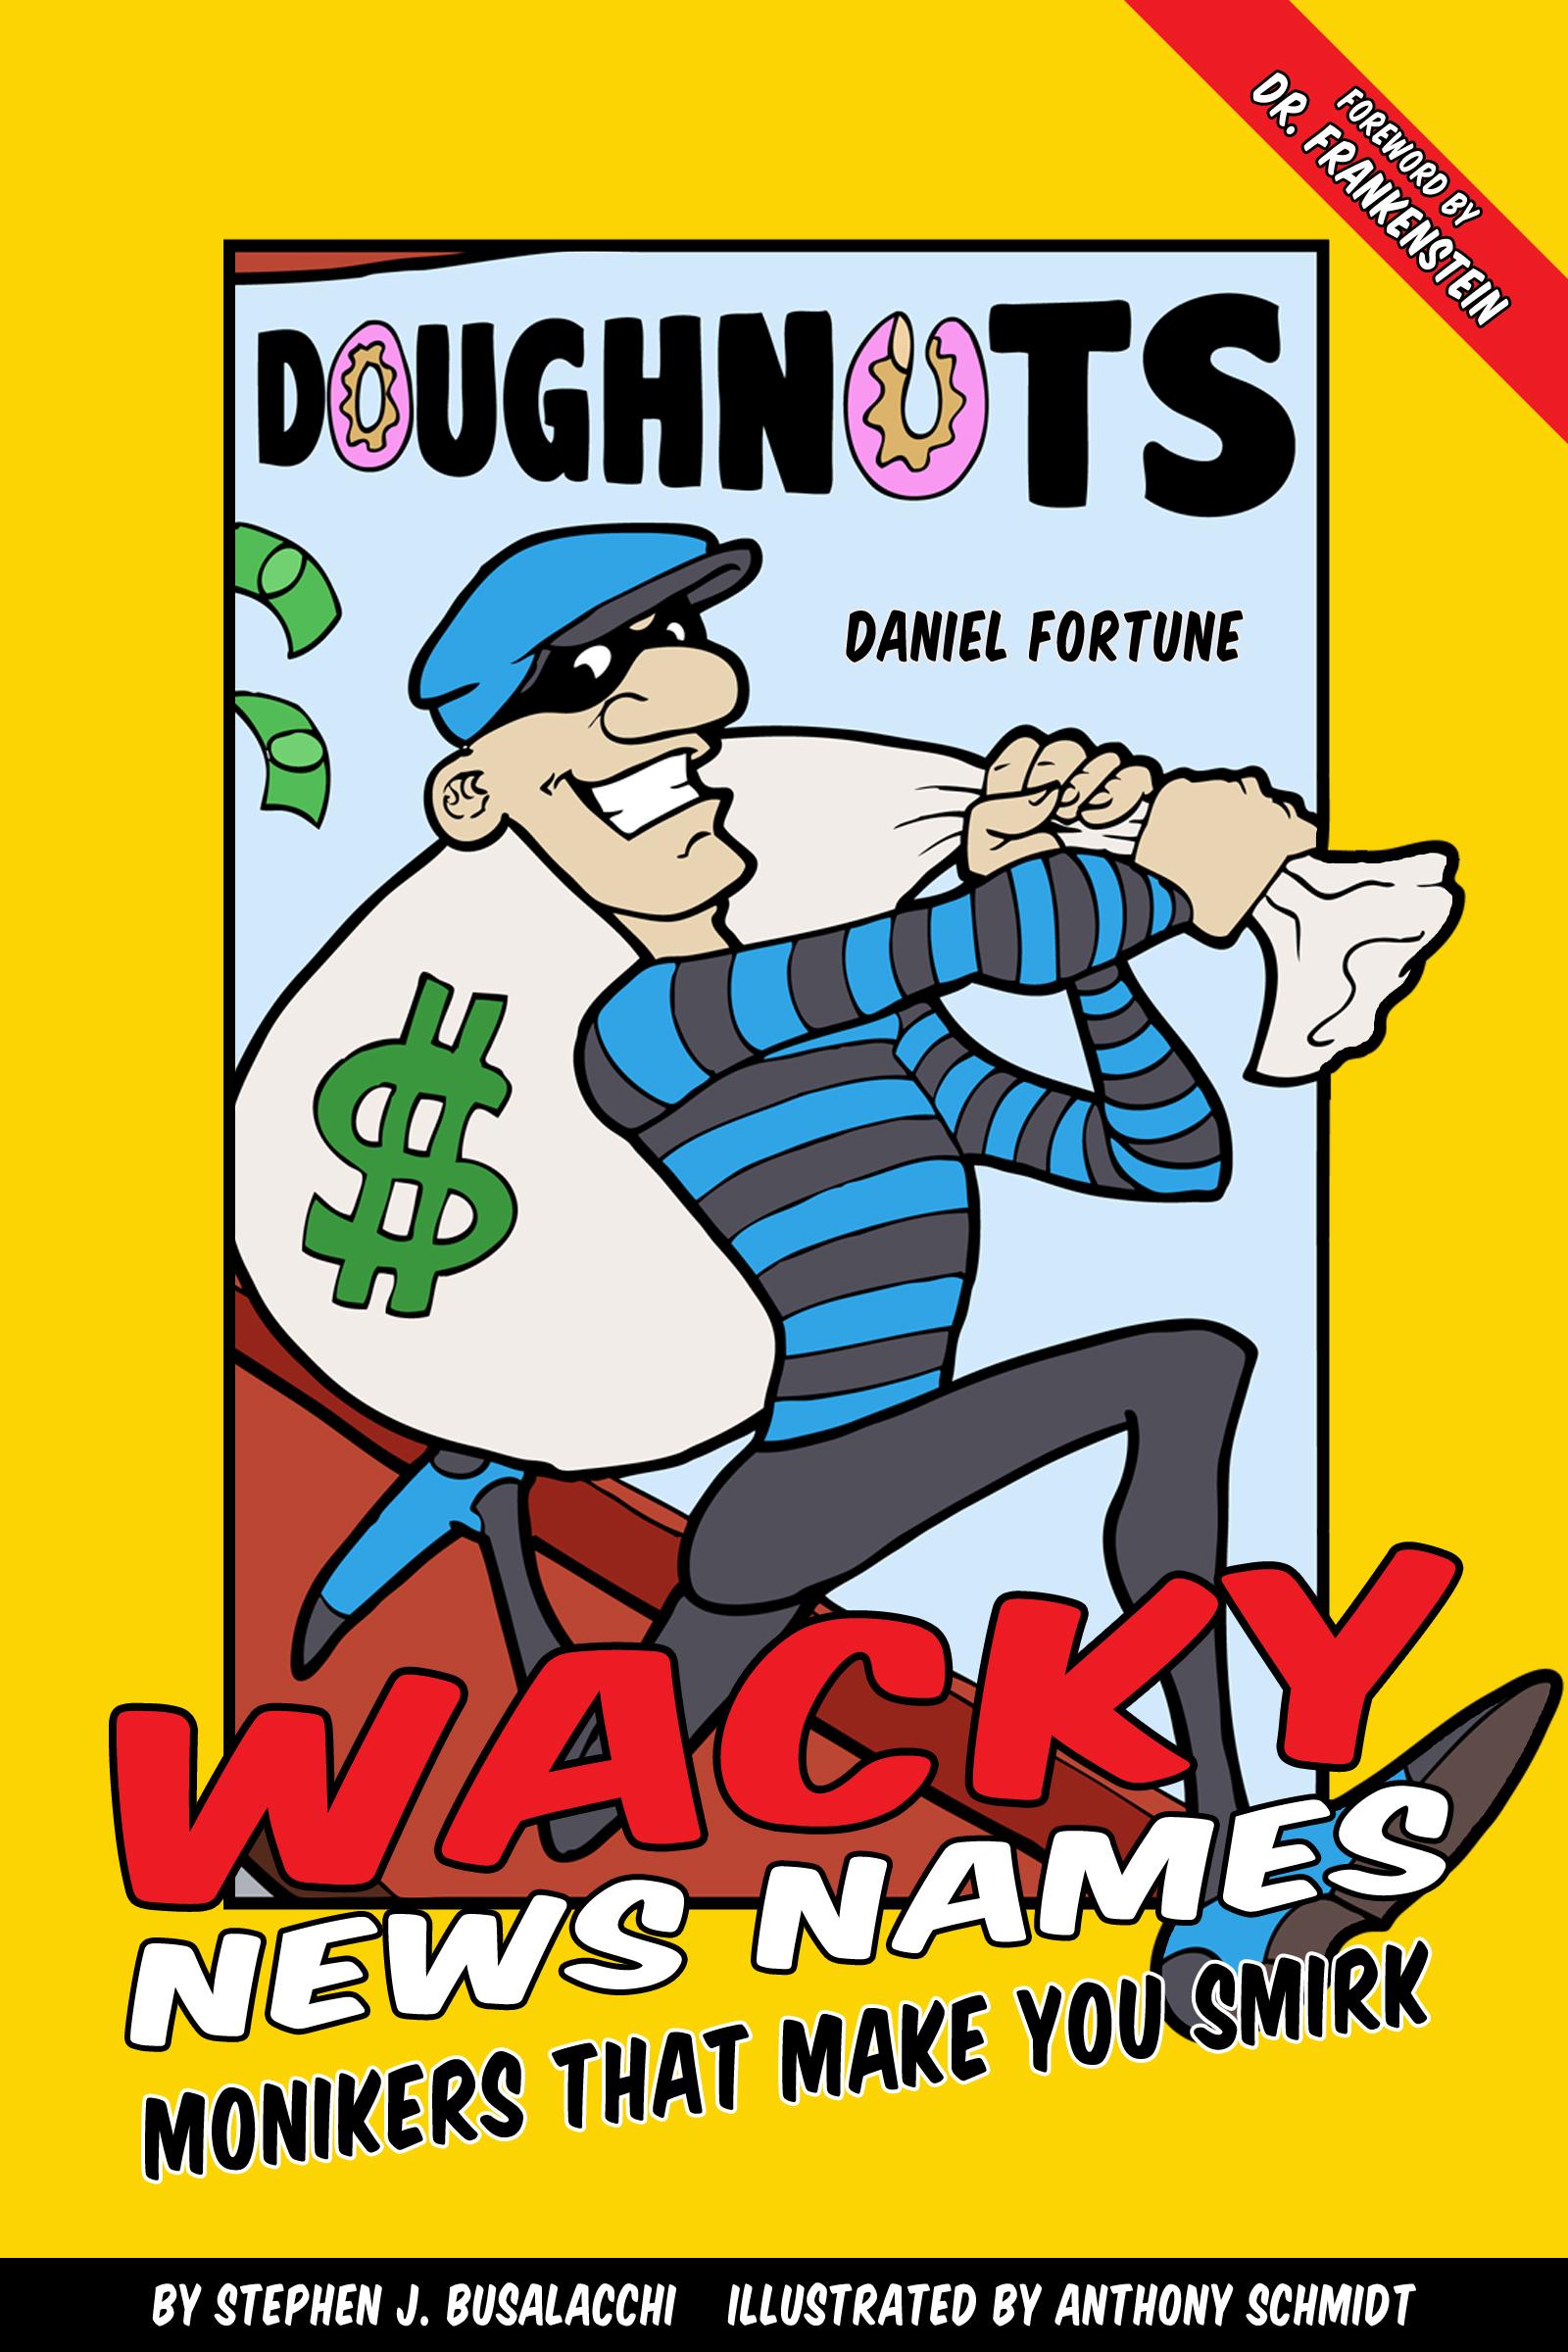 Wacky News Names E-Book